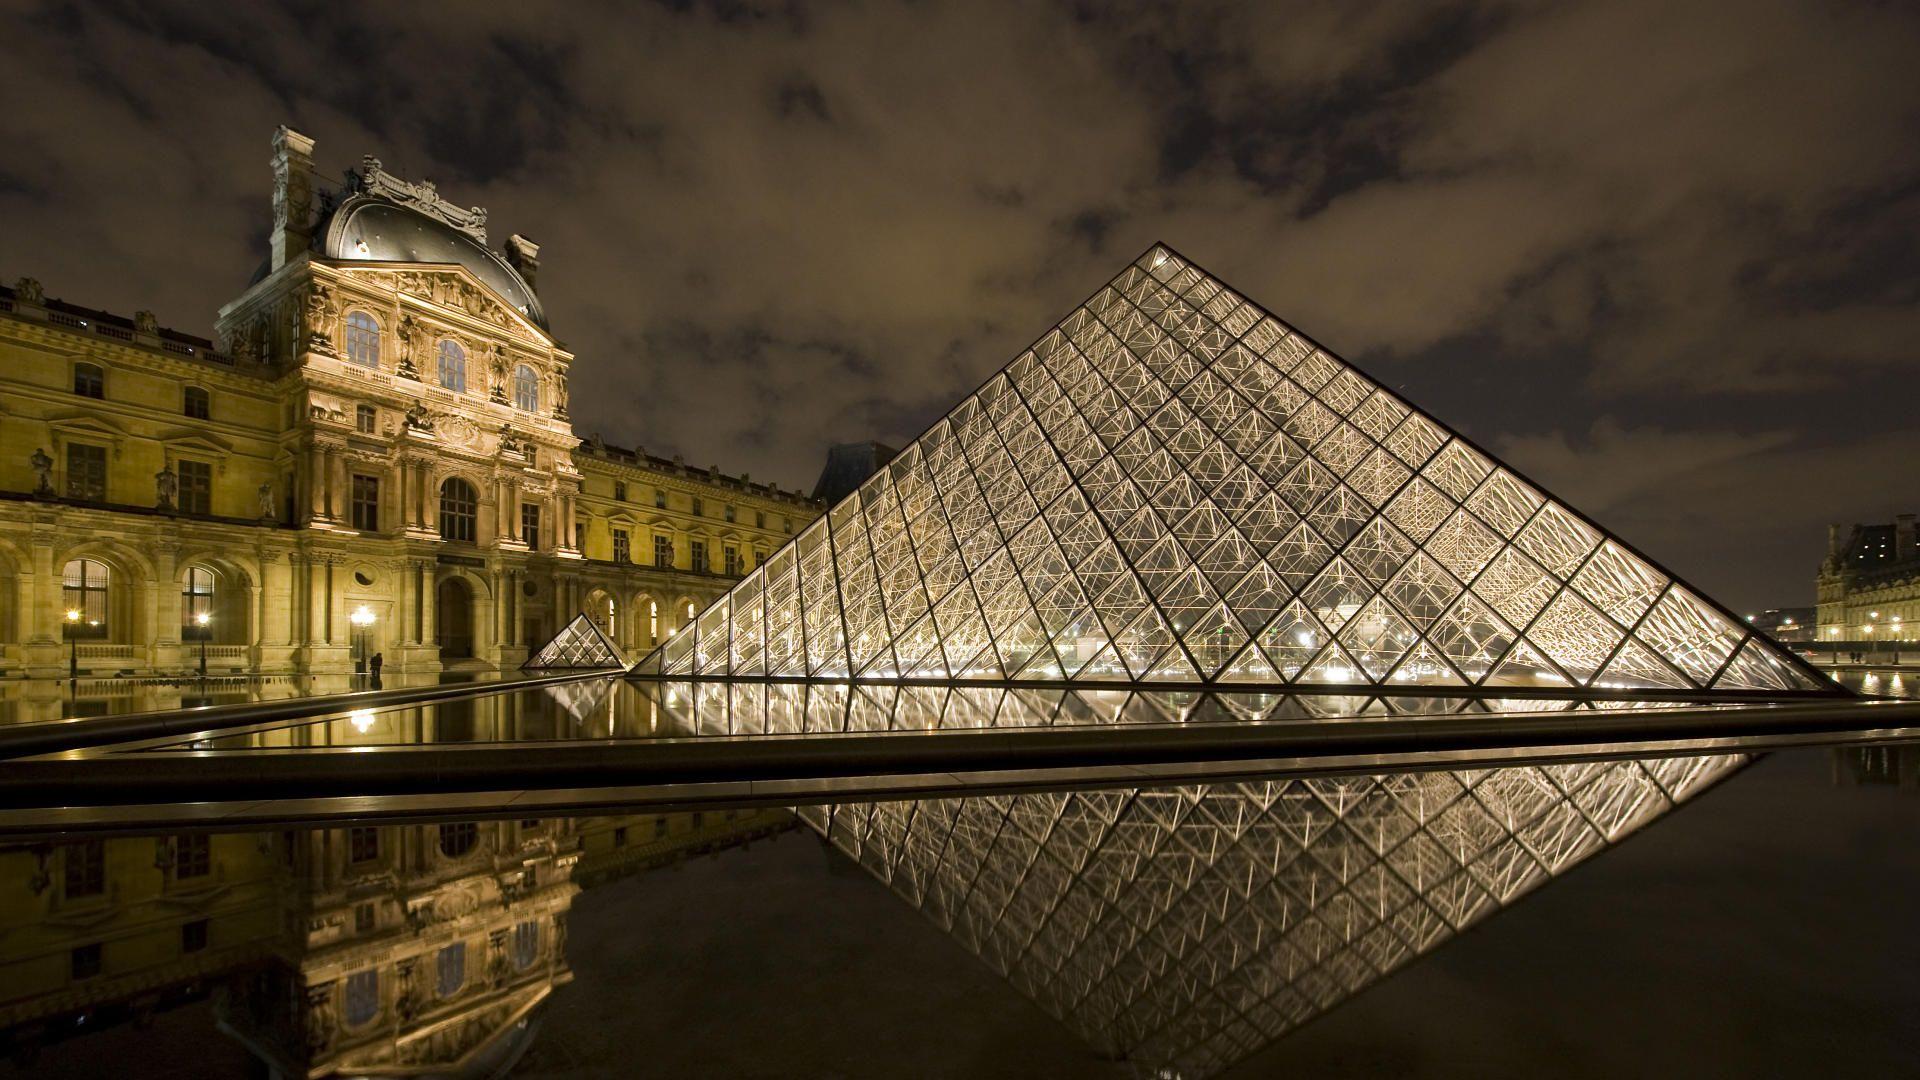 Louvre Pyramid at Night Paris Francejpg 1920x1080